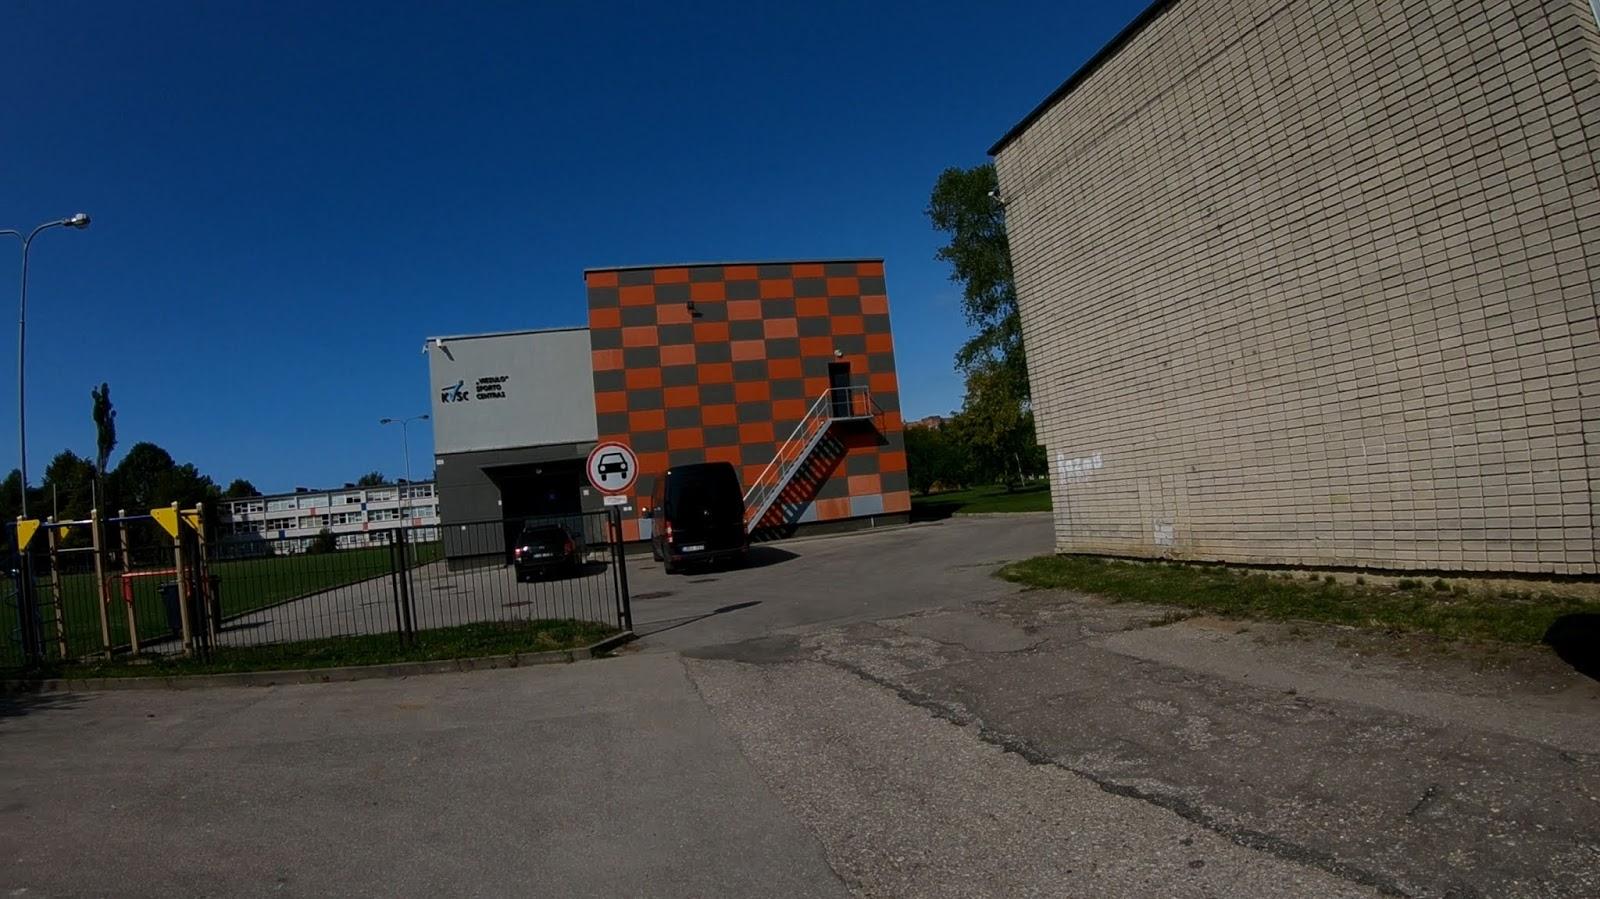 Спортивный центр Viesulas. 3 Фото